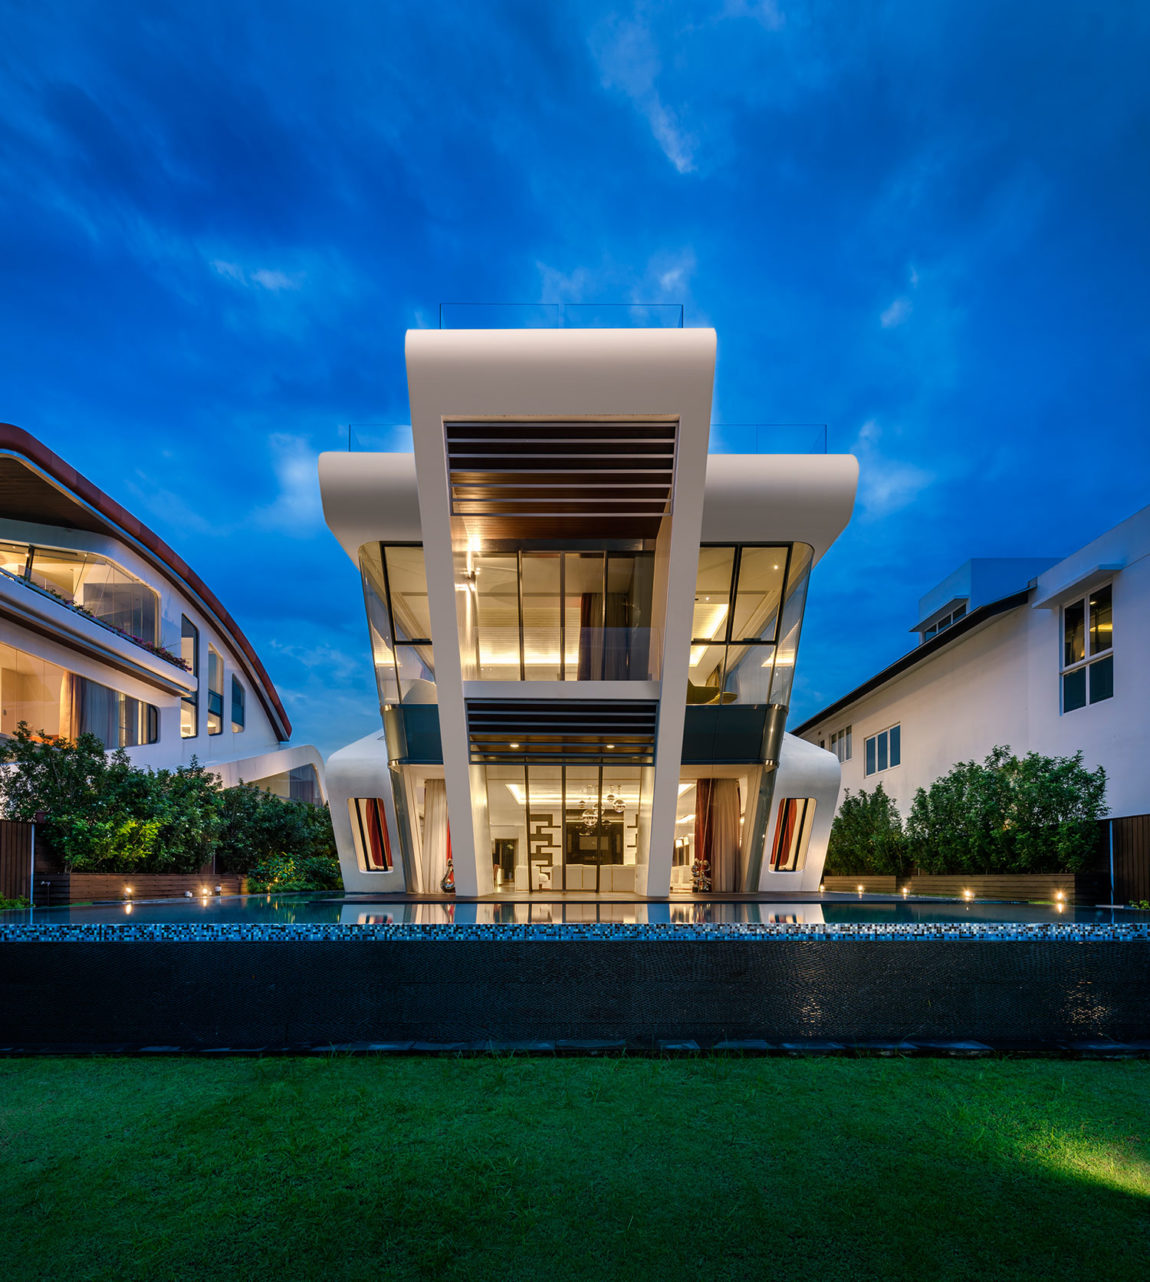 Villa Mistral by Mercurio Design Lab